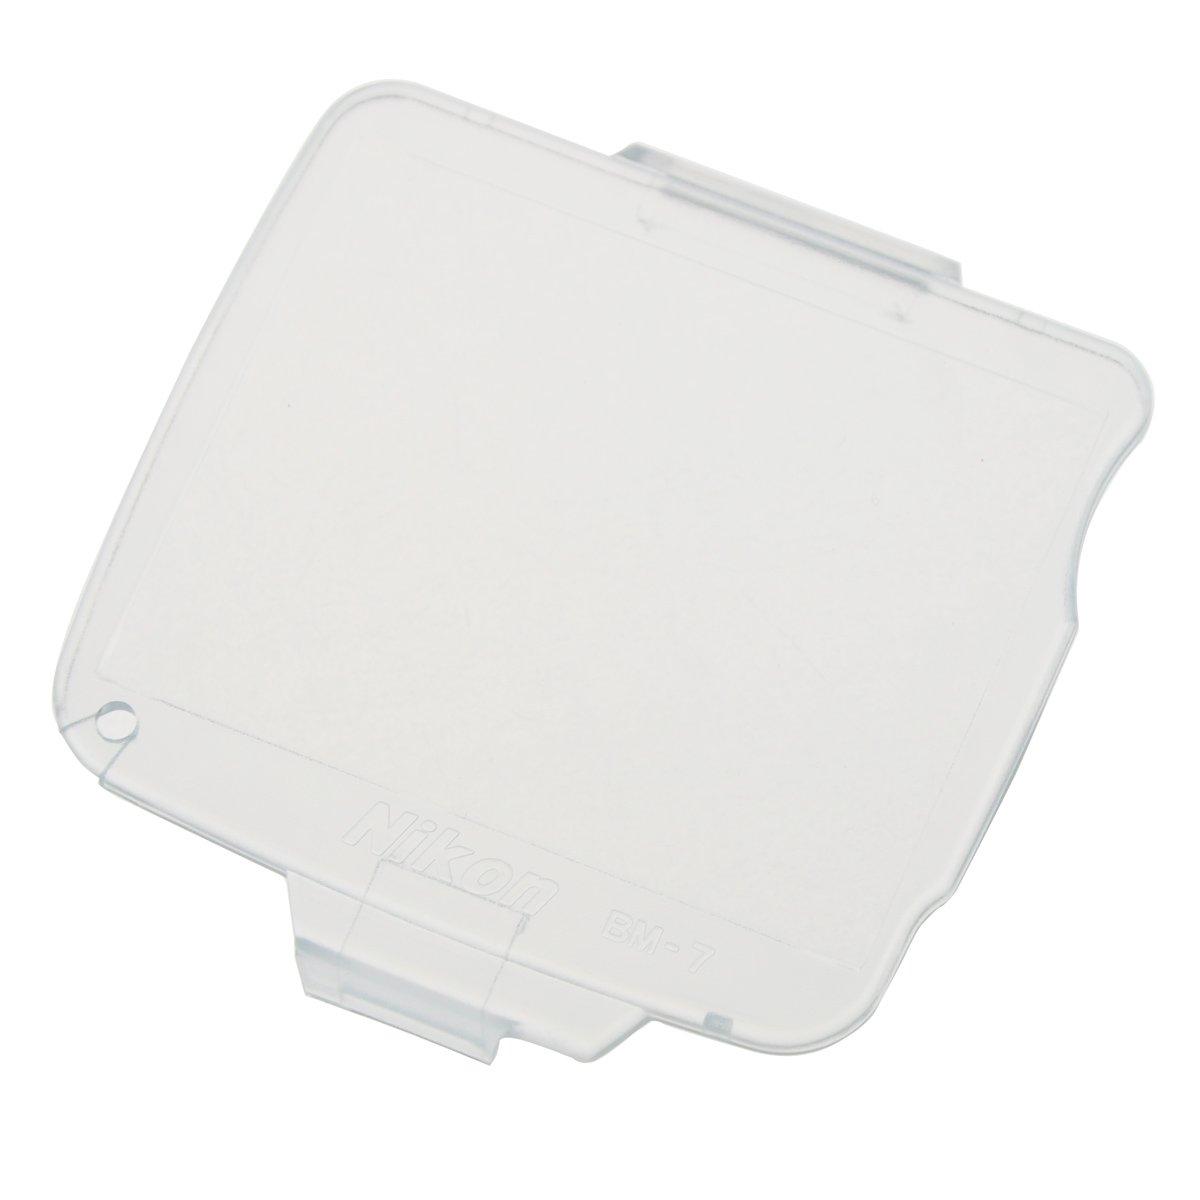 Plastic Slide-Co 11130 Screen Door Top Guide Mayfair, Pack of 2